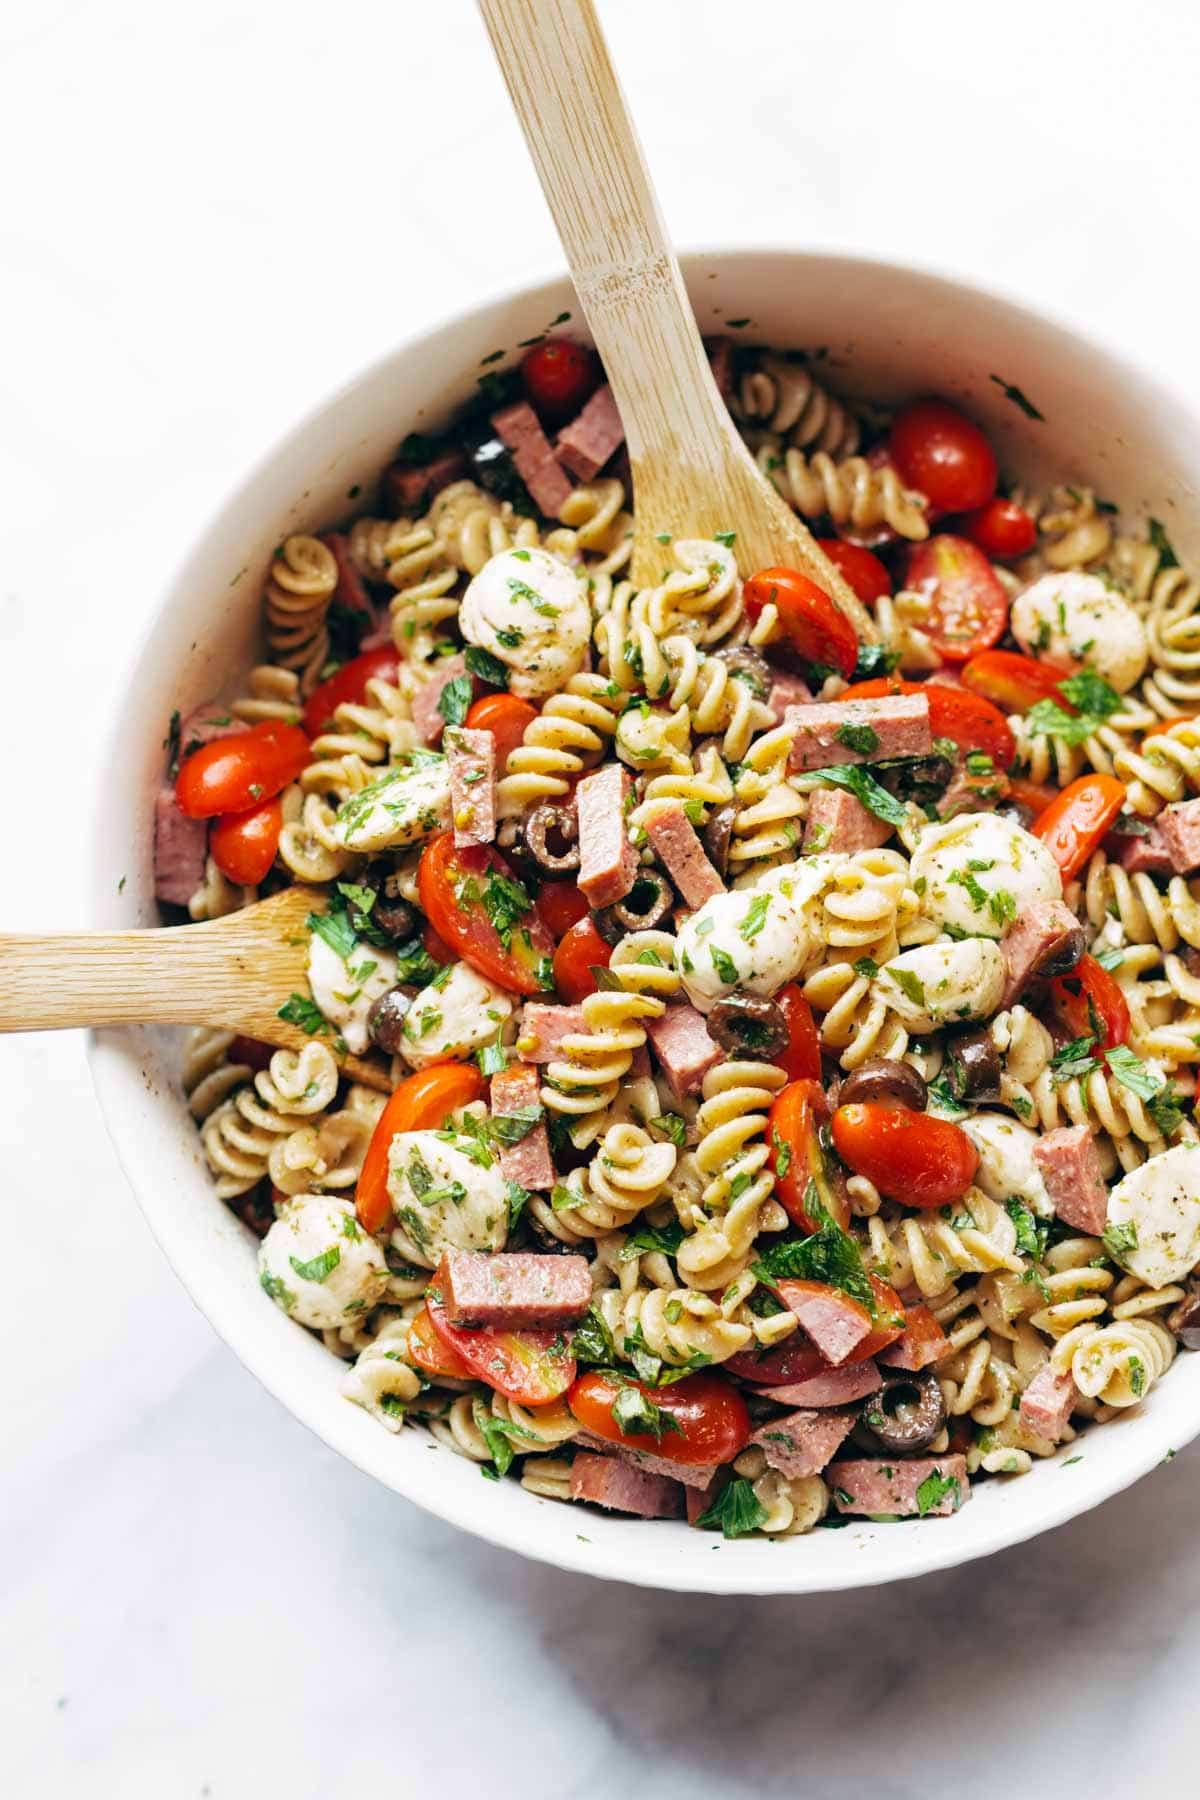 Simple Pasta Salad  Best Easy Italian Pasta Salad Recipe Pinch of Yum